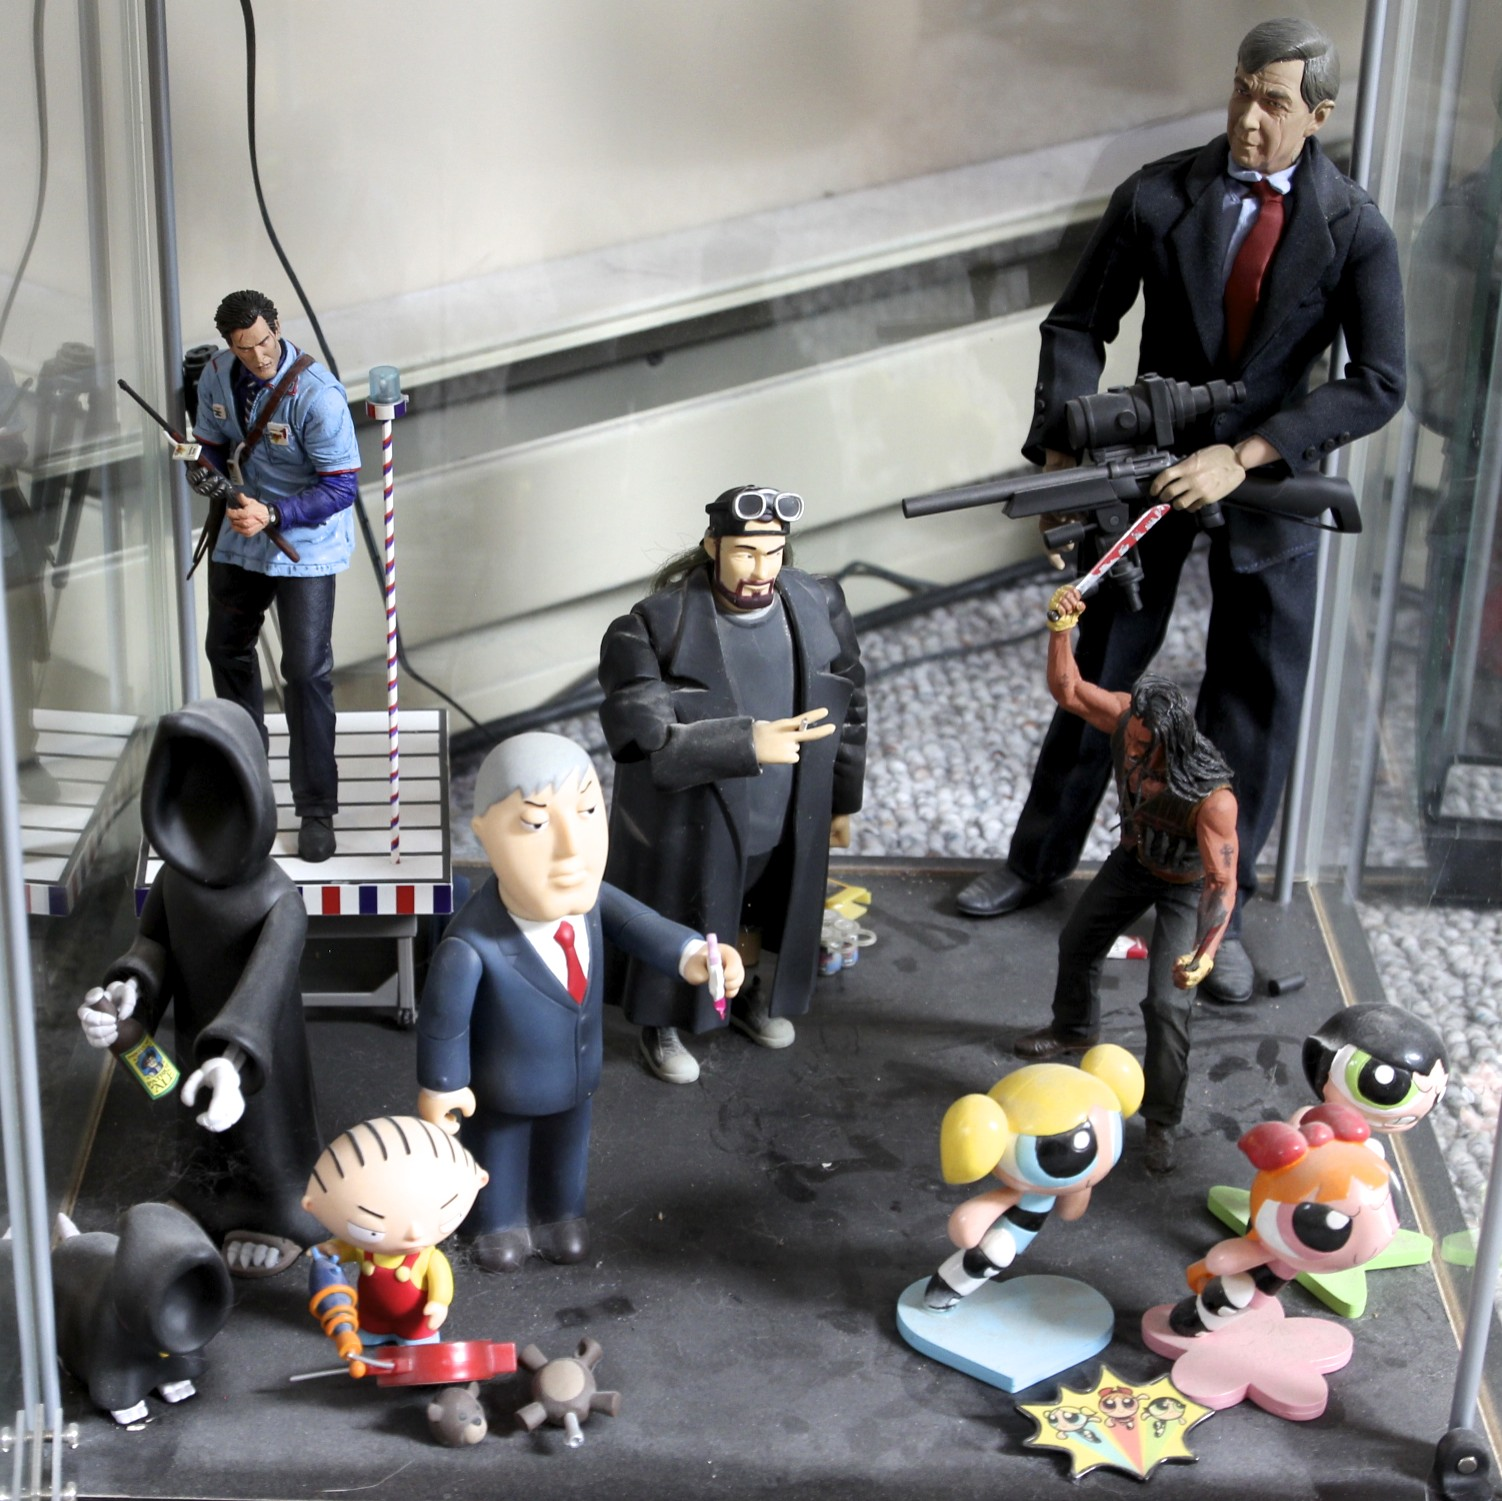 Army of Darkness  Ash, Silent Bob,  X-Files  Cigarette Smoking Man,  Family Guy  Death, Mayor West and Stewie, Machete, Powerpuff Girls.